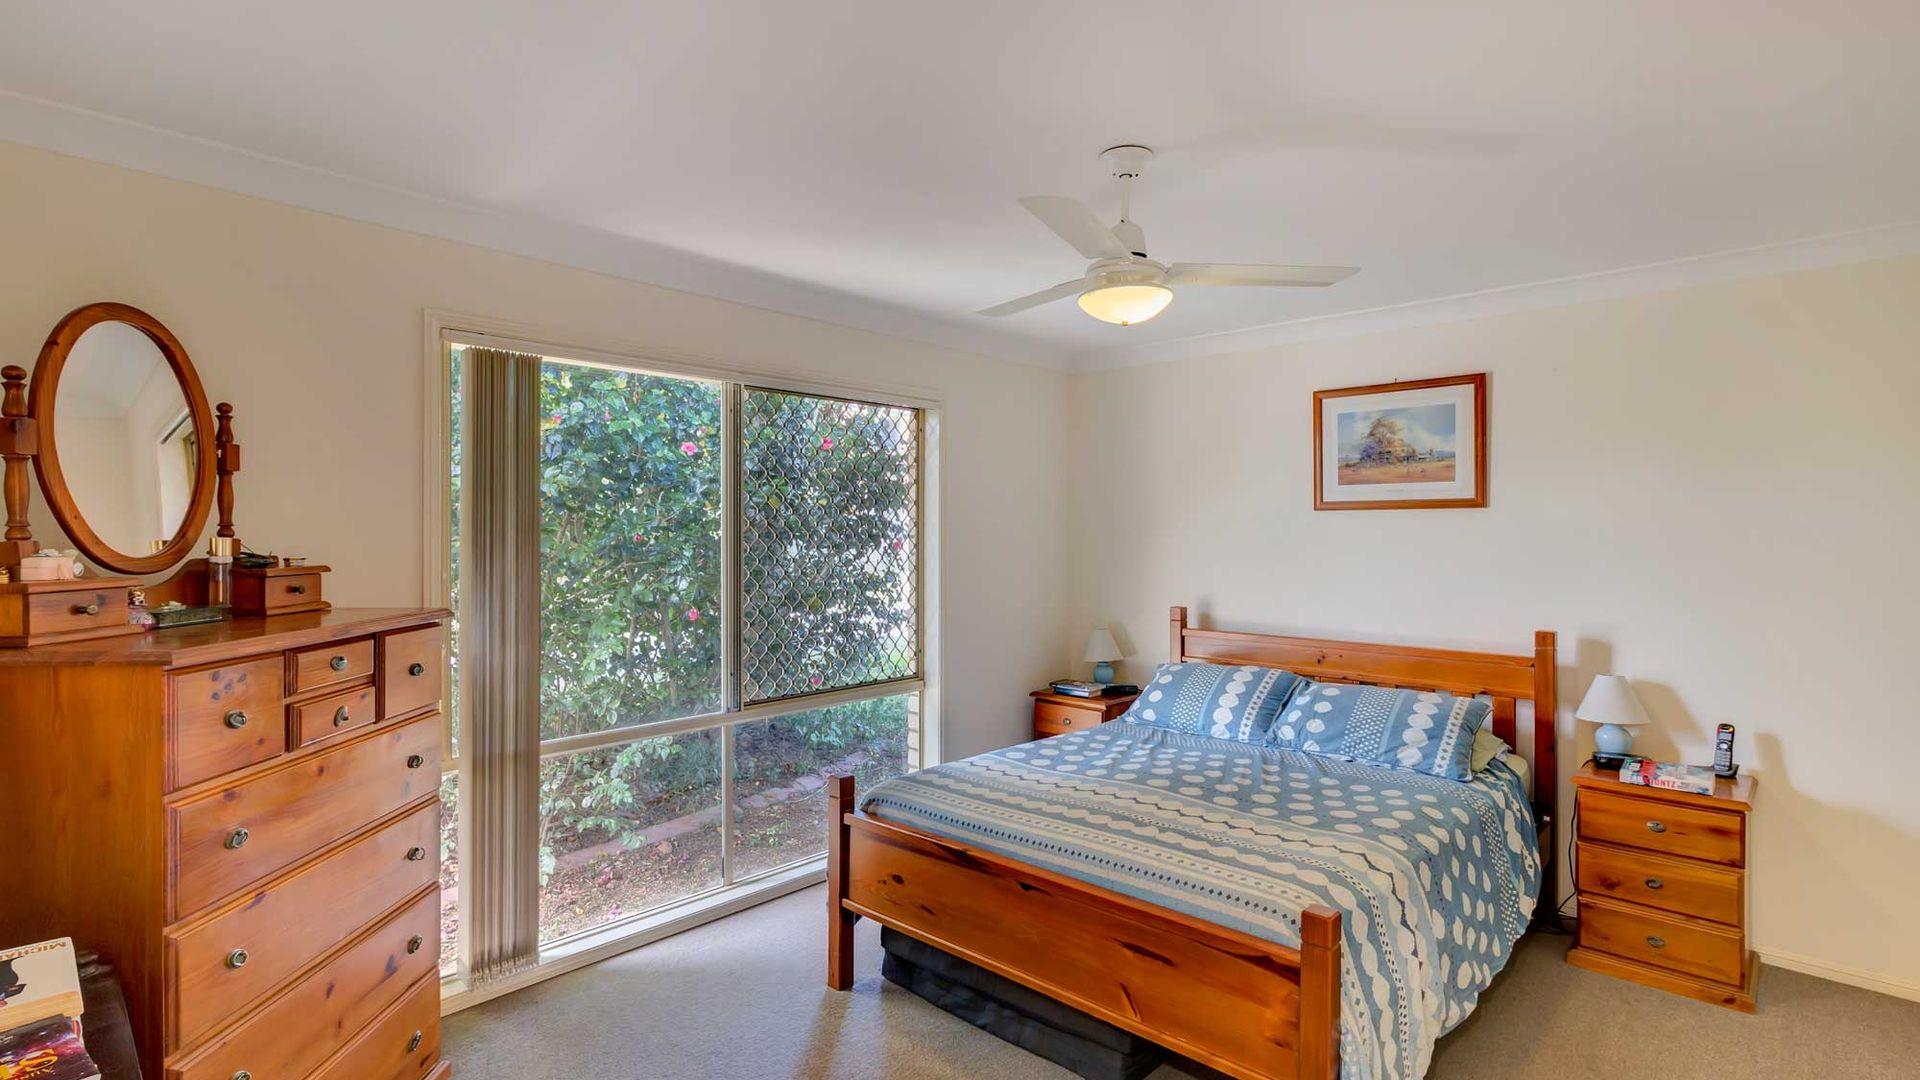 174 Macquarie Way, Drewvale QLD 4116, Image 2